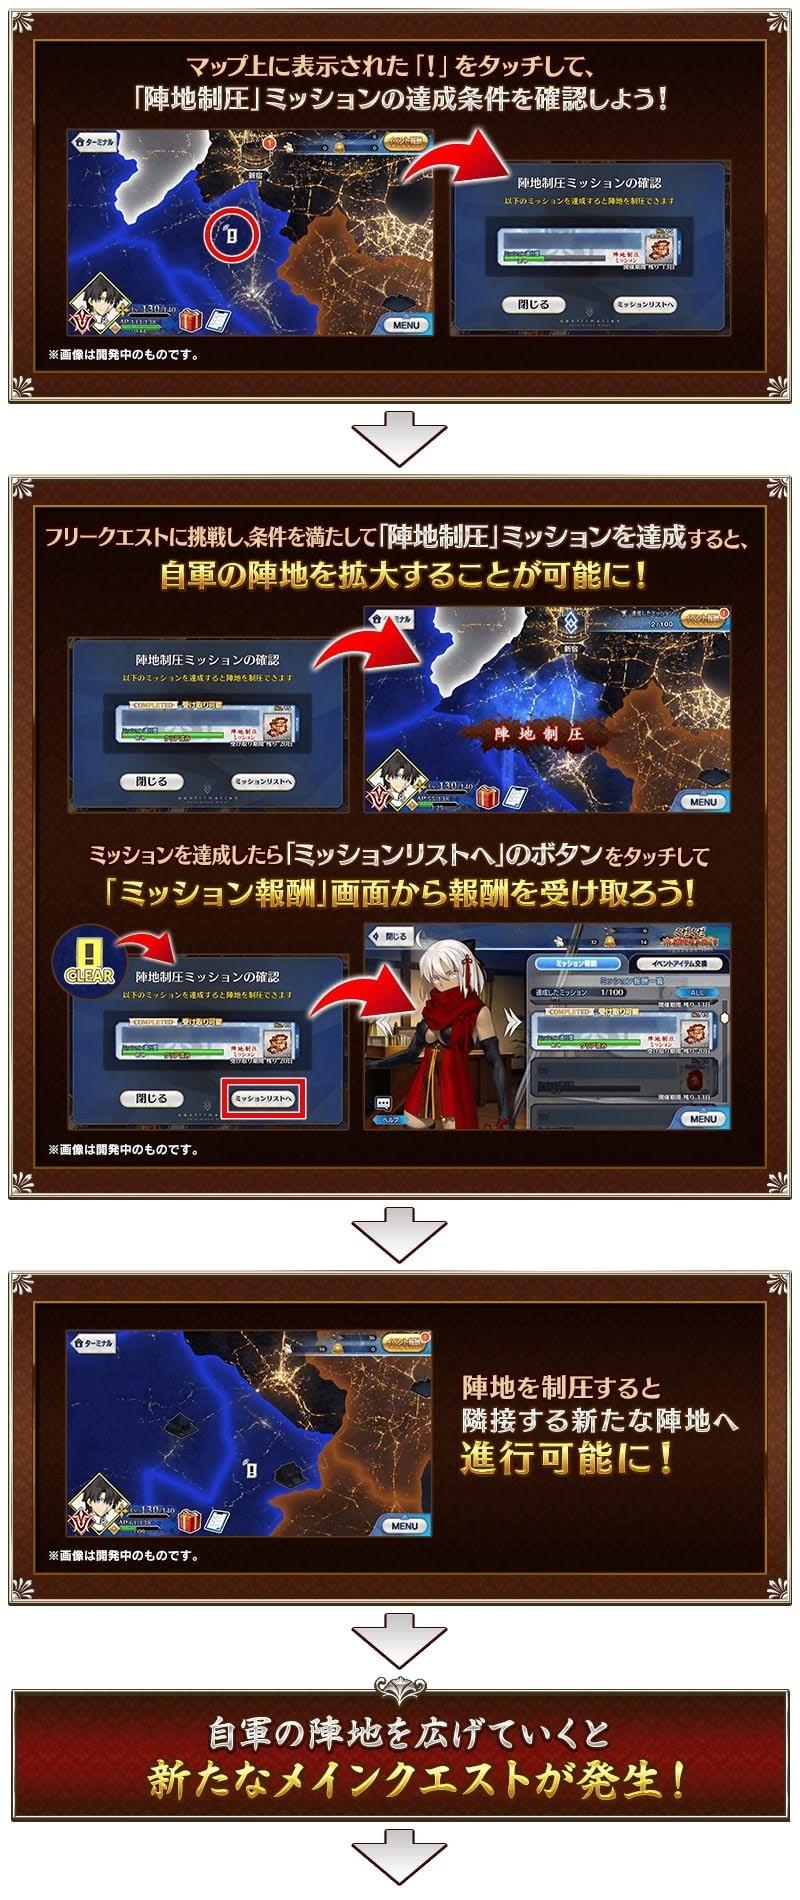 info_image_03.jpg